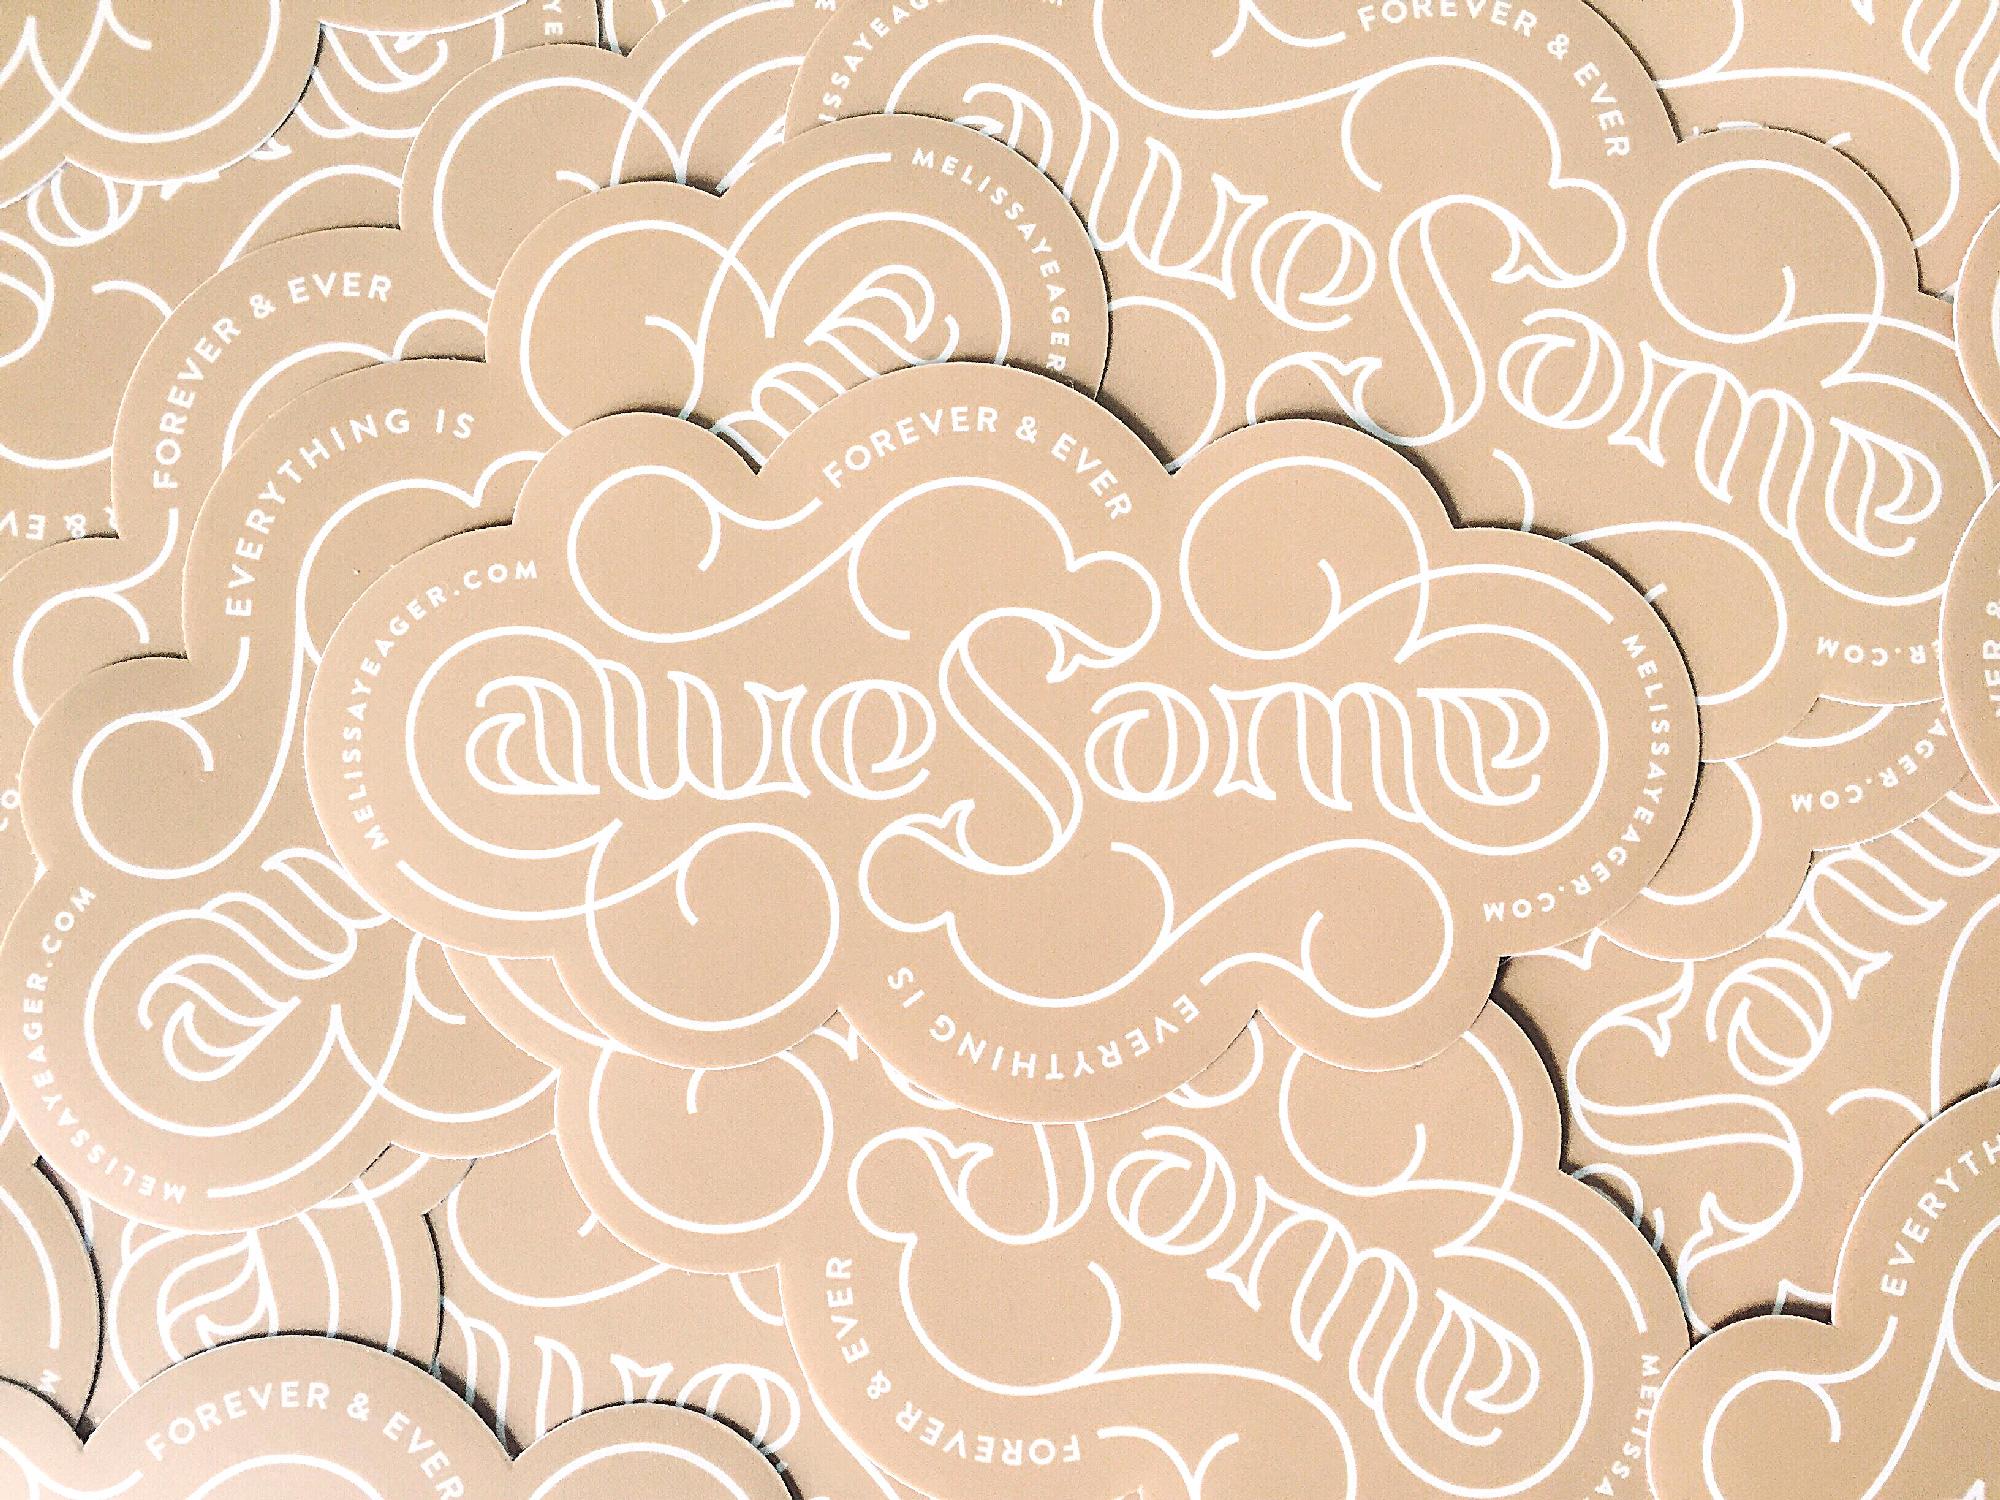 Awesome ambigram - Melissa Yeager